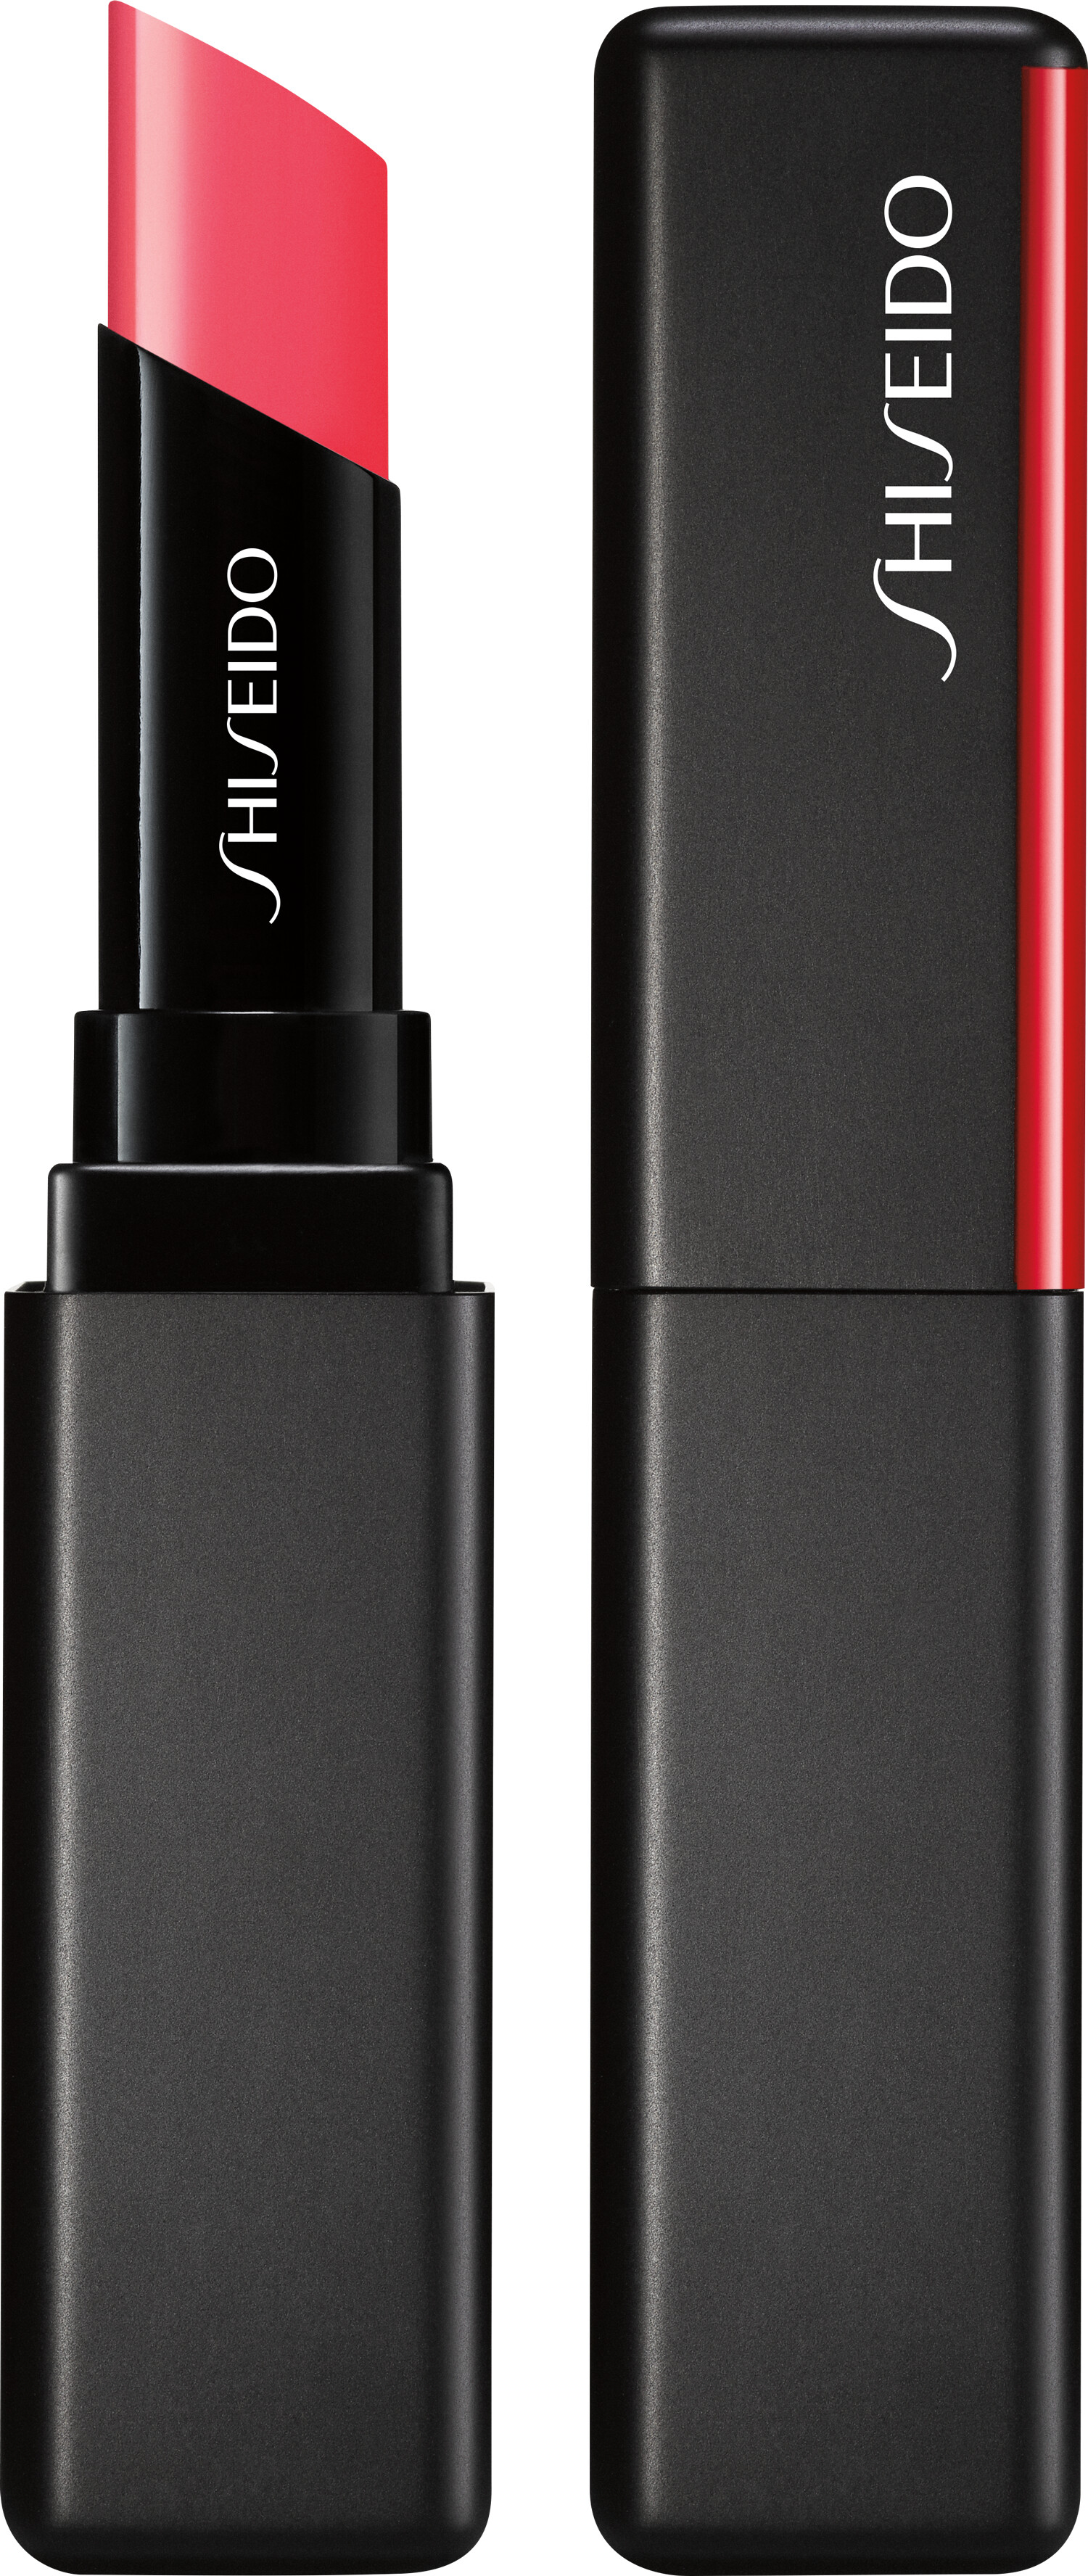 Shiseido VisionAiry Gel Lipstick 1.6g 217 - Coral Pop